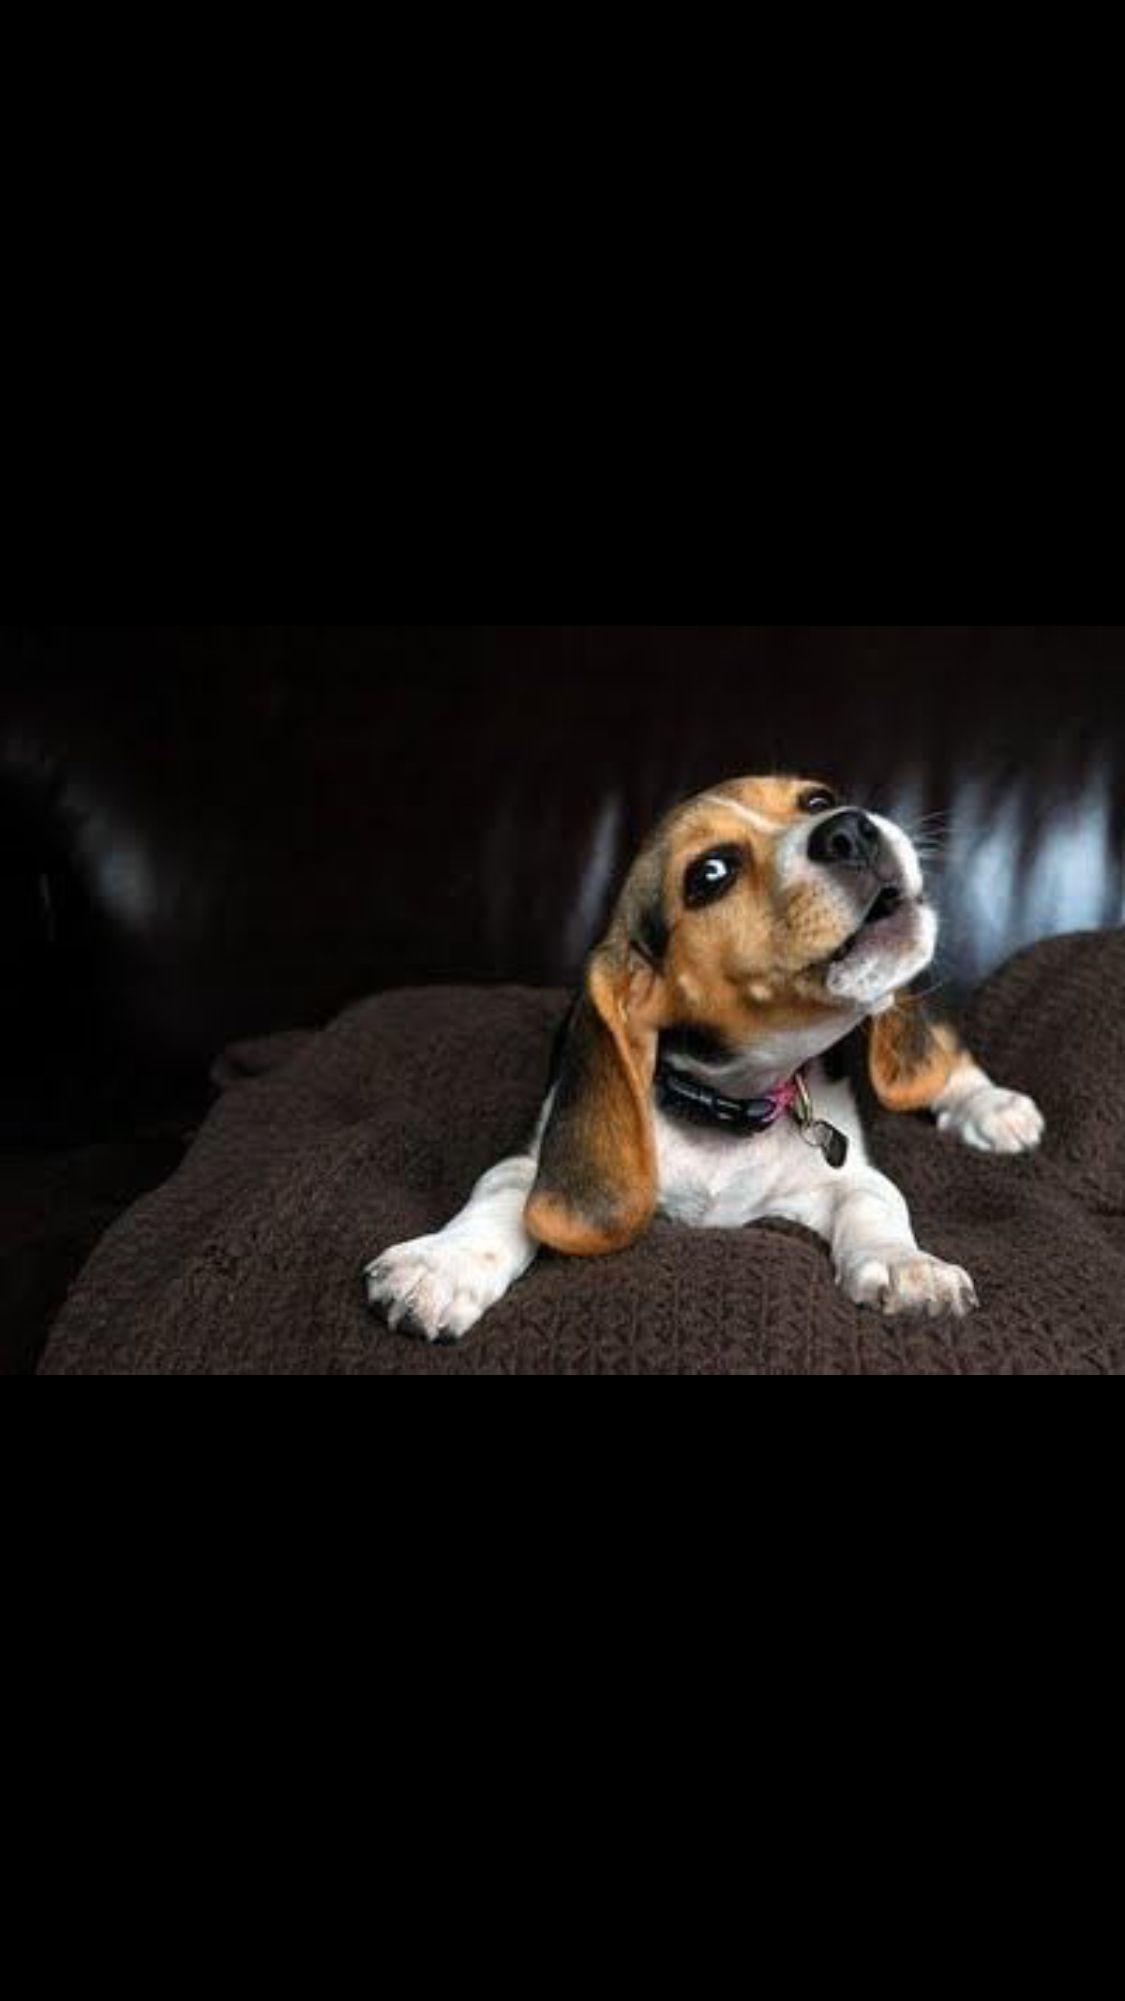 The Windup The Arooooo Cute Dogs Beagle Puppy Dog Breeds